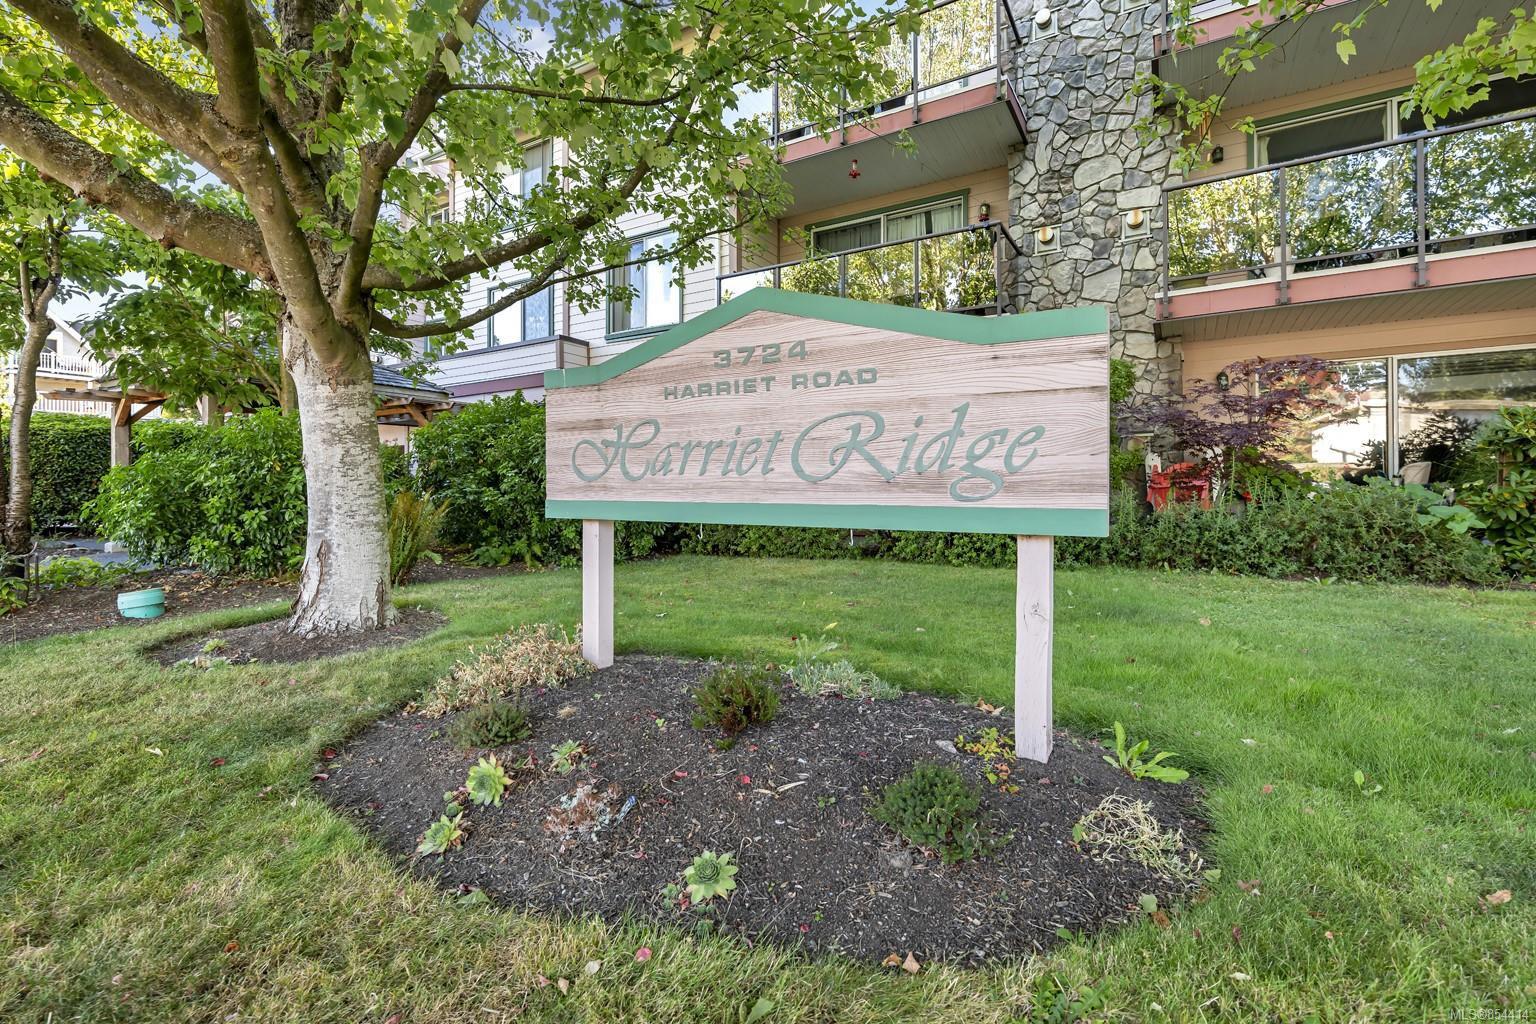 Main Photo: 306 3724 Harriet Rd in : SW Gateway Condo Apartment for sale (Saanich West)  : MLS®# 854414